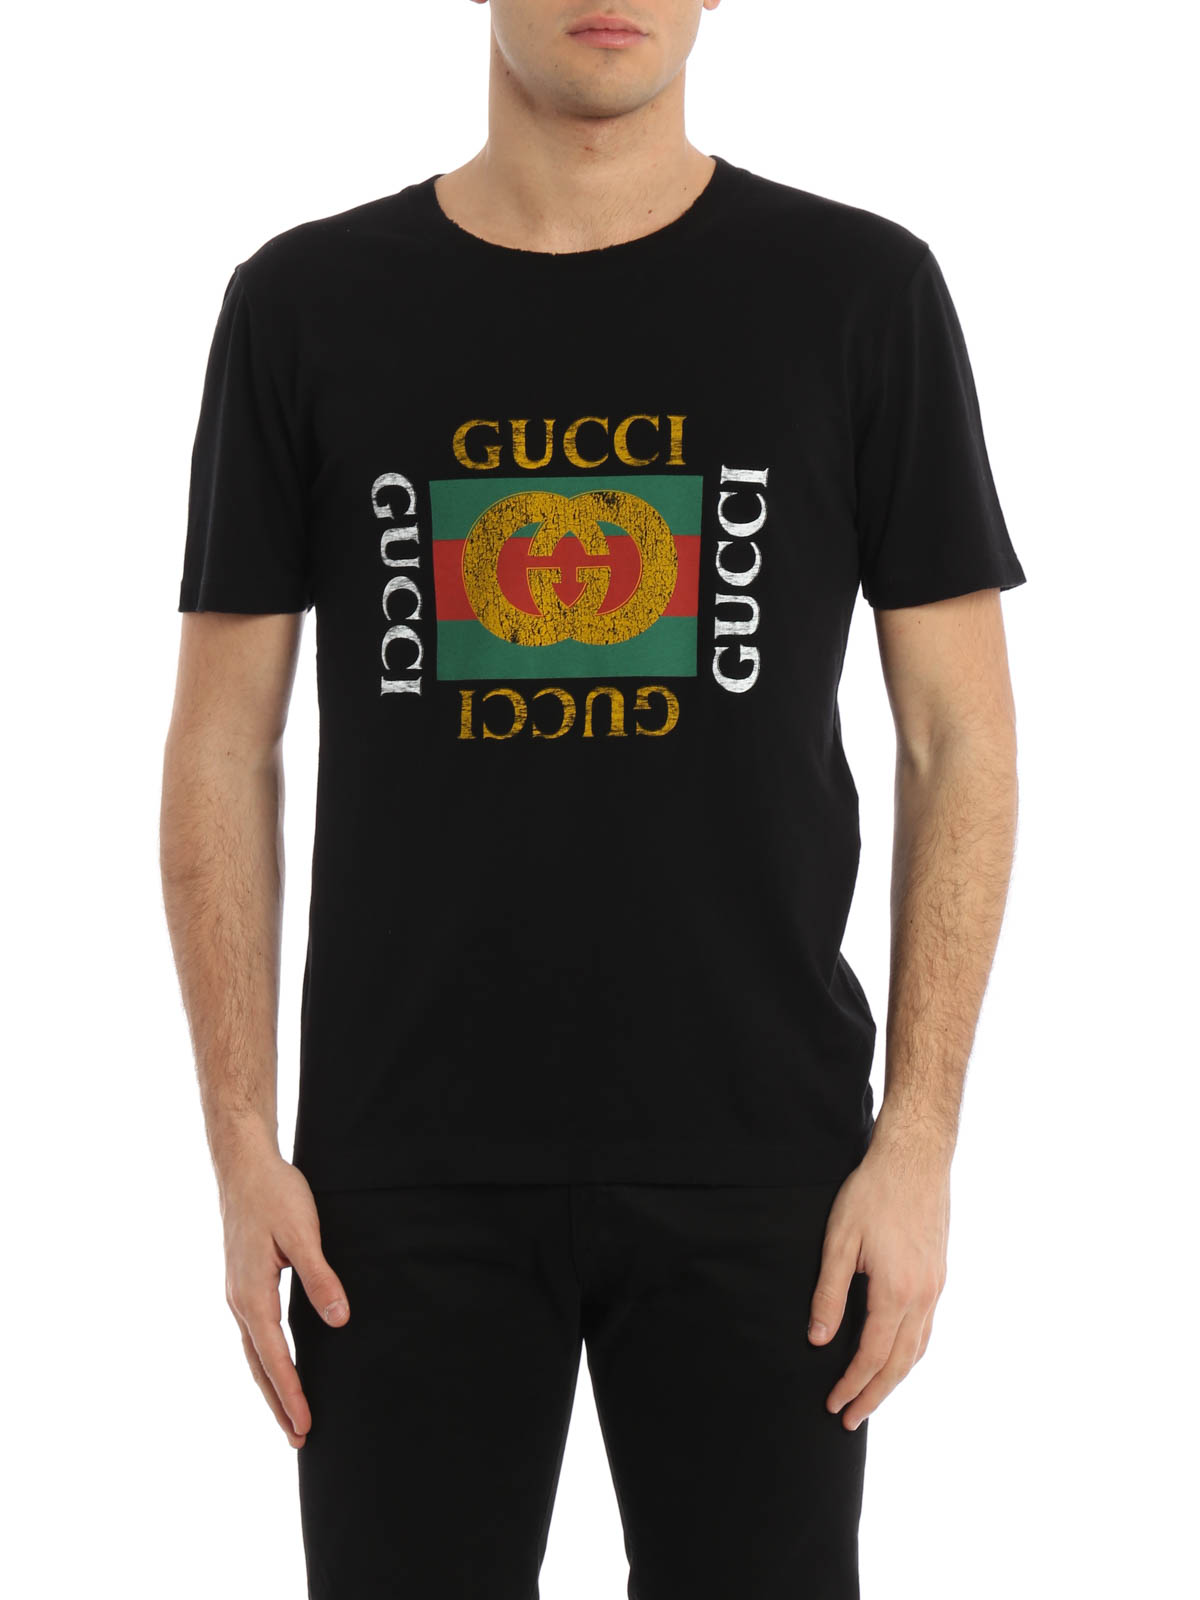 8886c221a Gucci - Camiseta Negra Para Hombre - Camisetas - 440103 X3F06 1508